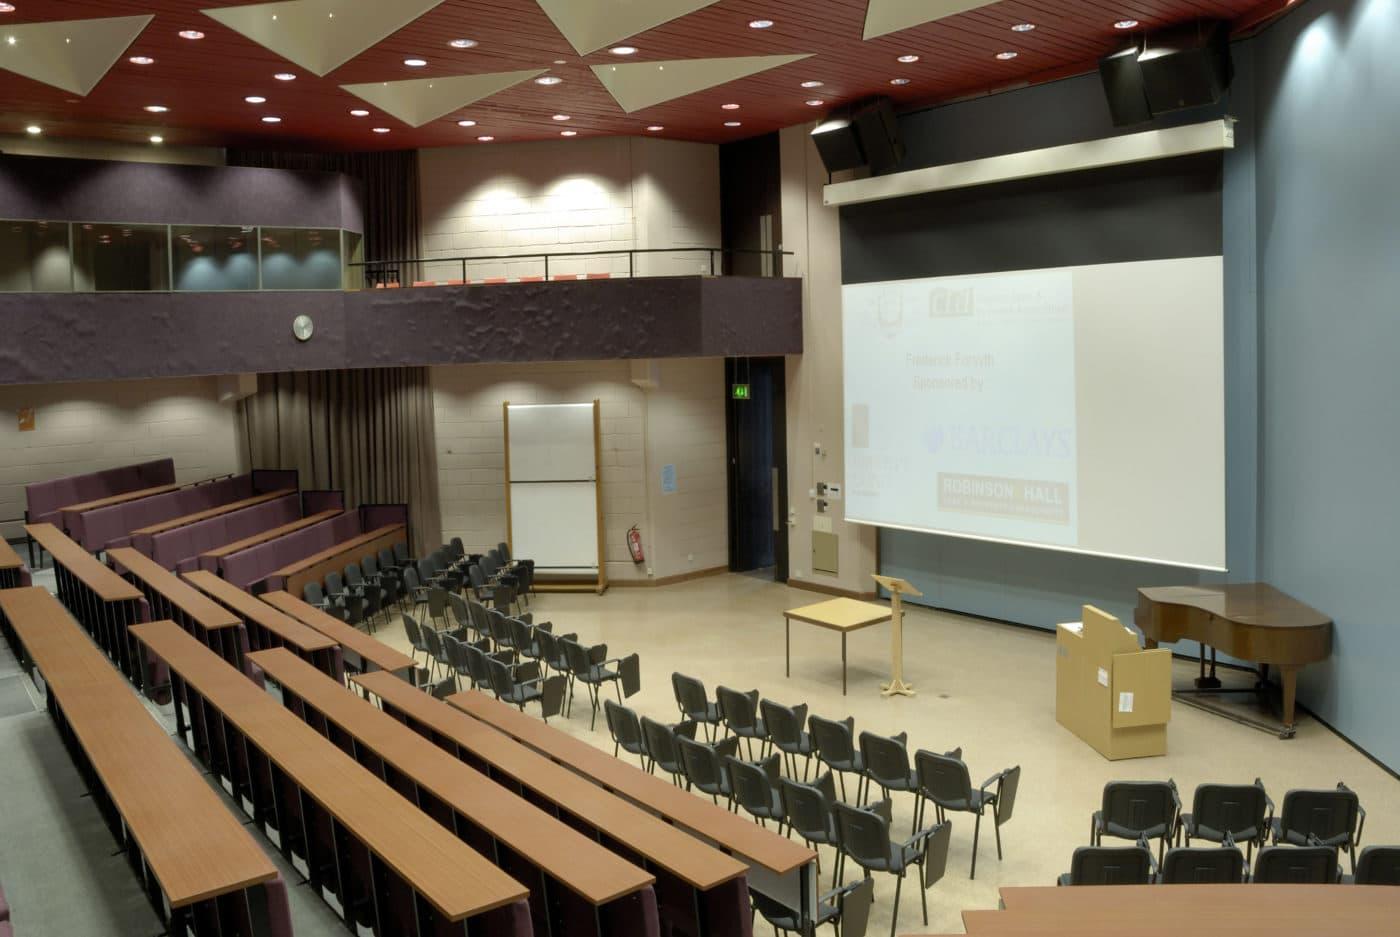 Lecture Theatre Building